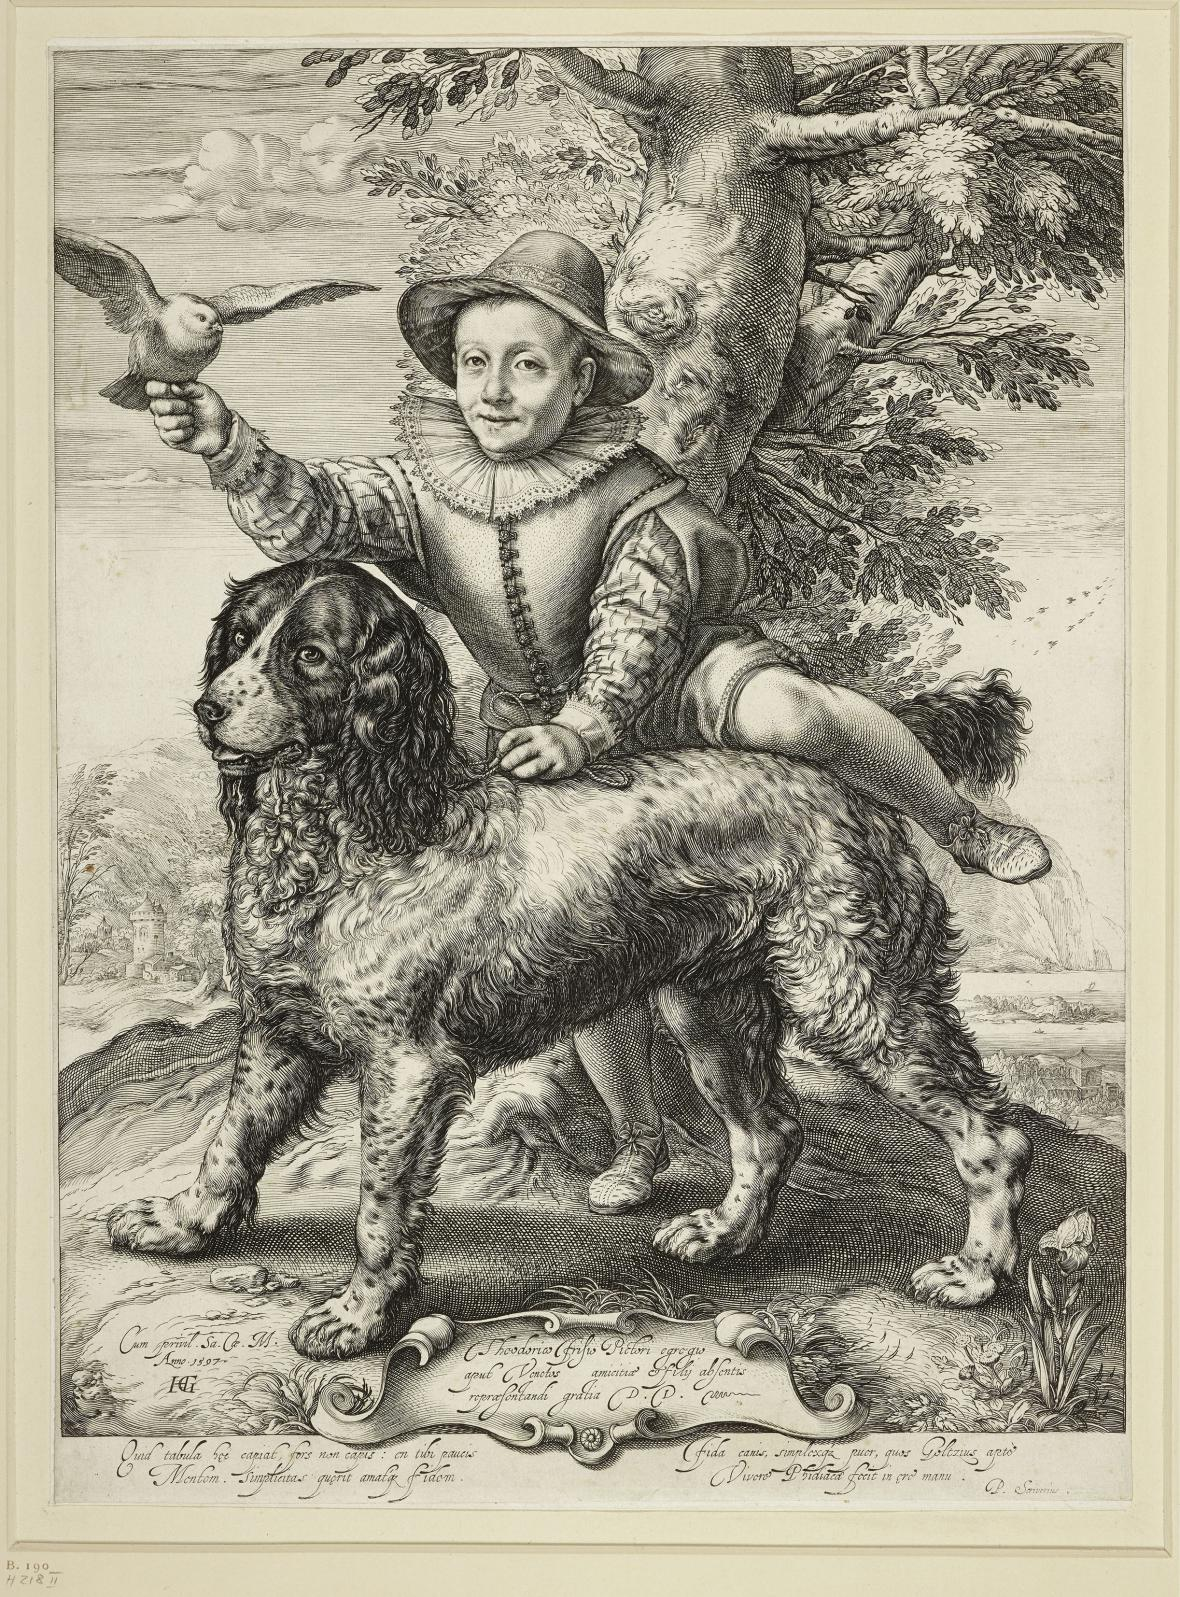 Hendrick Goltzius / Frederick de Vries se Goltziusovým psem, 1597